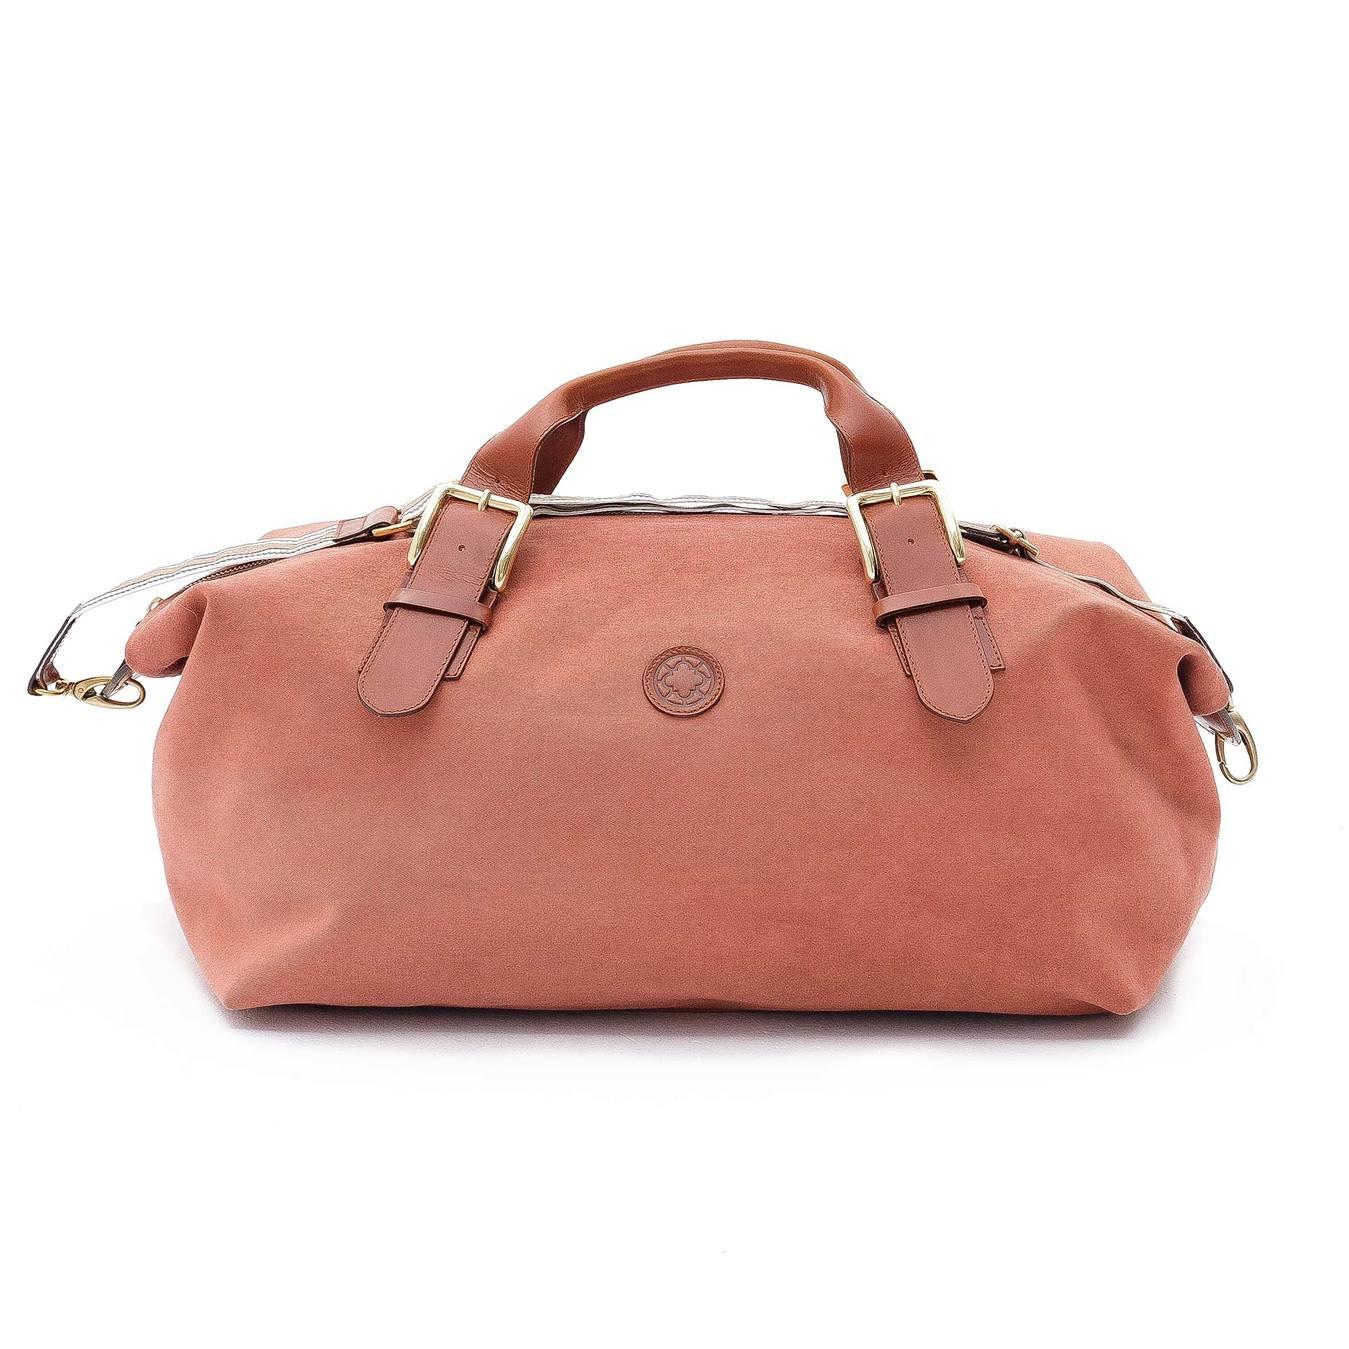 La Portegna - La Portegna Waterproof Hand Made Stone Washed Canvas Terracotta Red Travel Bag